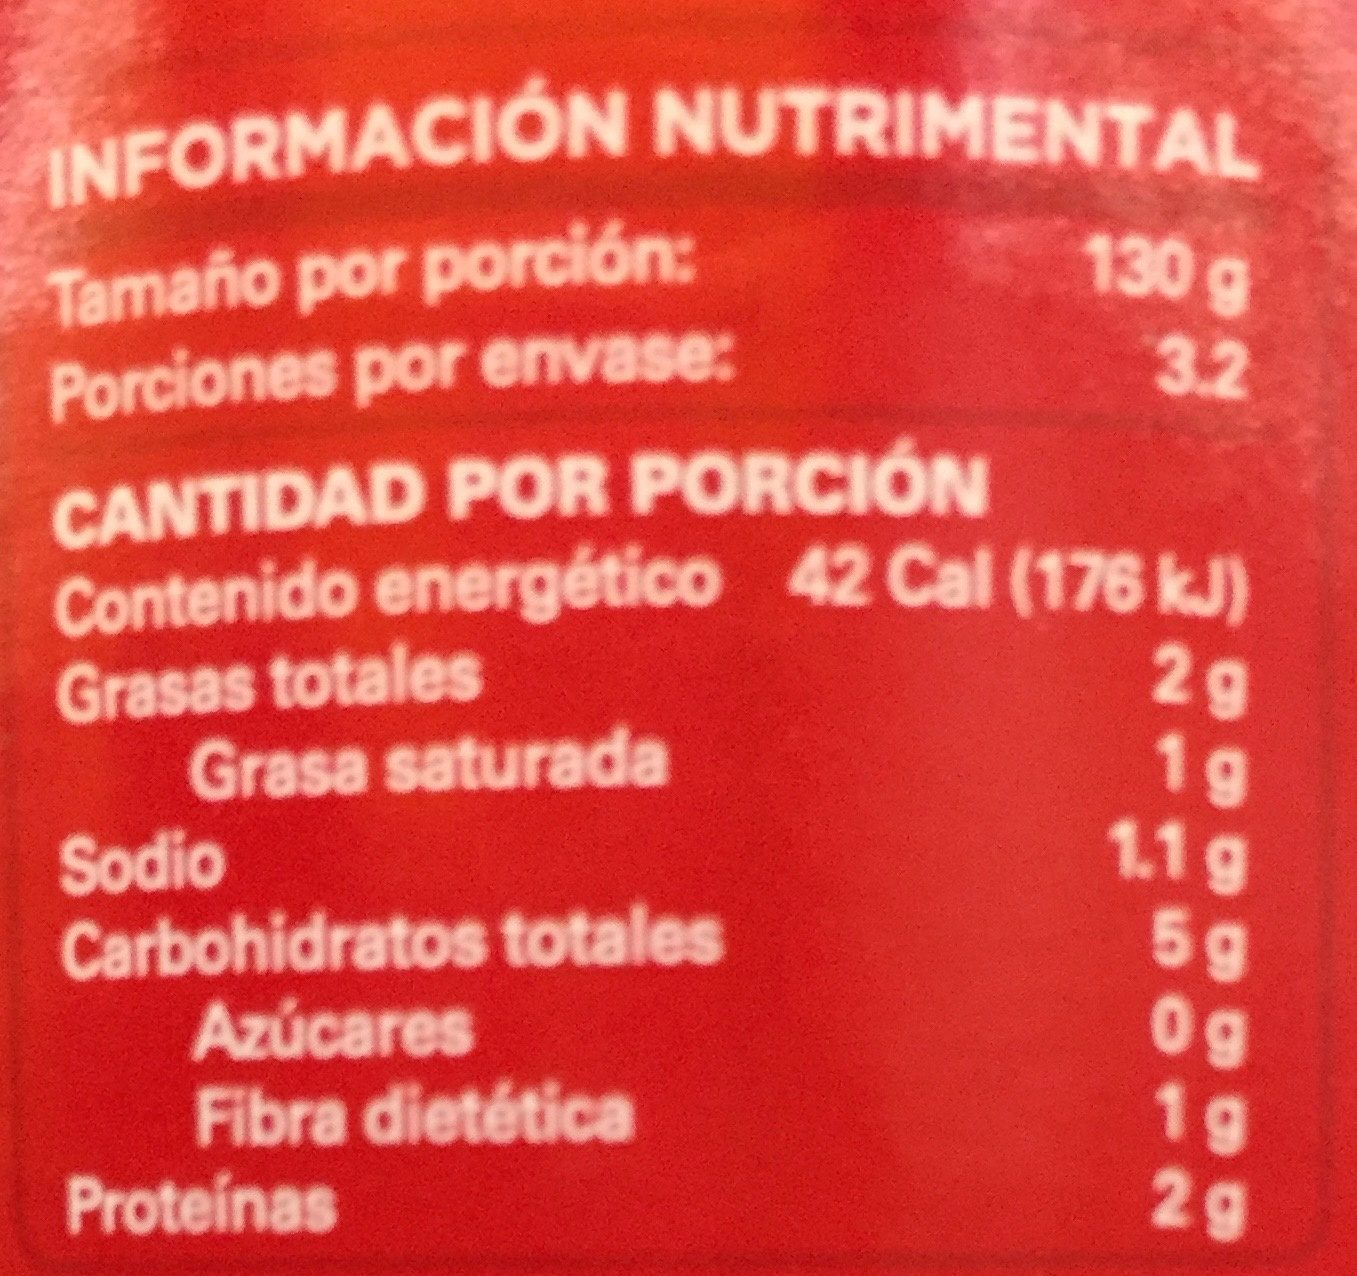 SALSA VERDE PARA ENCHILADAS - Nutrition facts